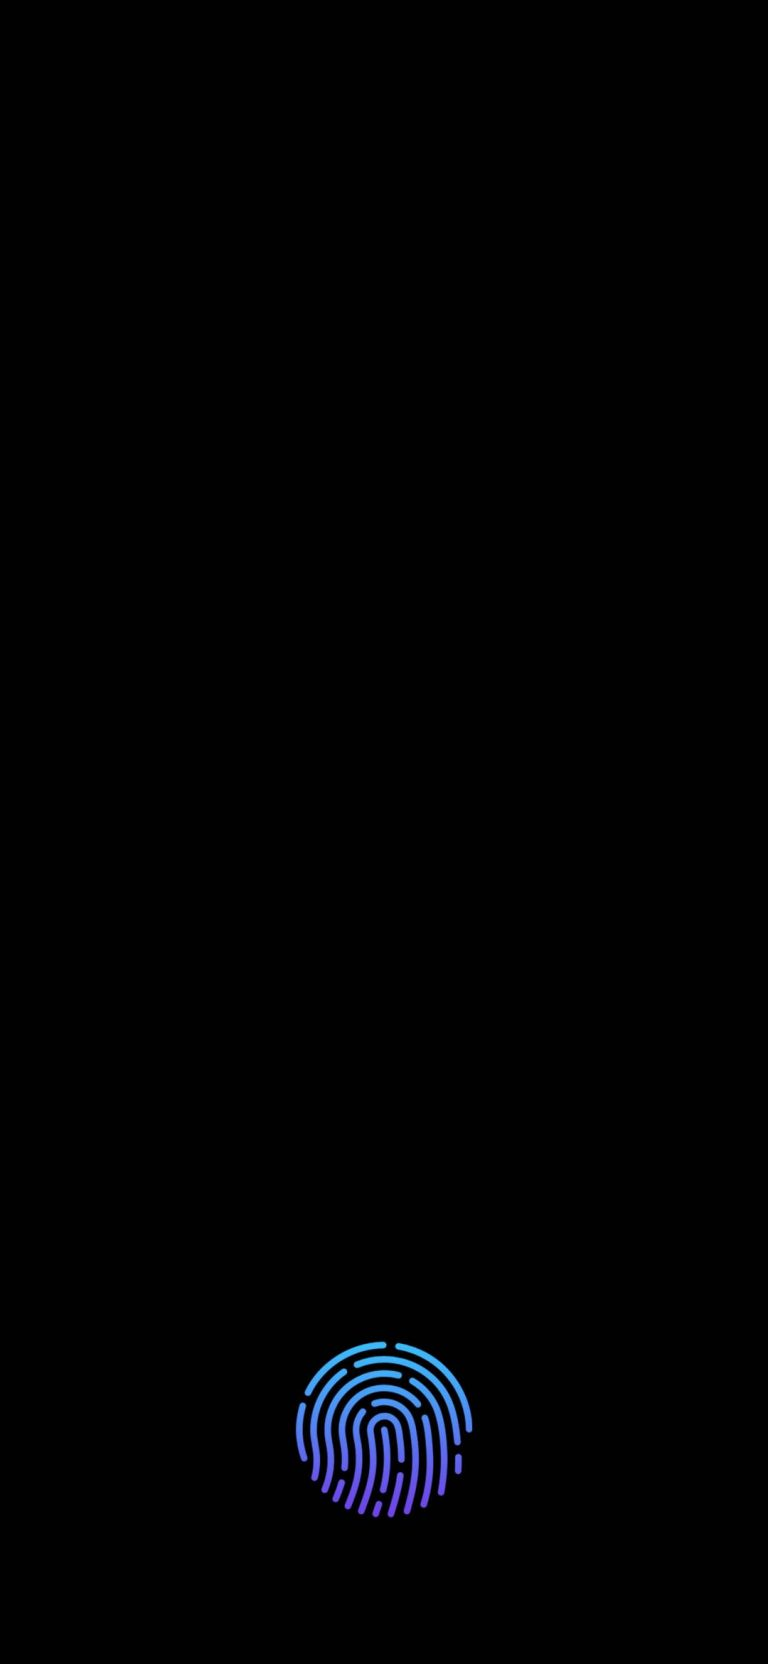 Scan Fingerprint Lock Screen Wallpaper - 1080x2340